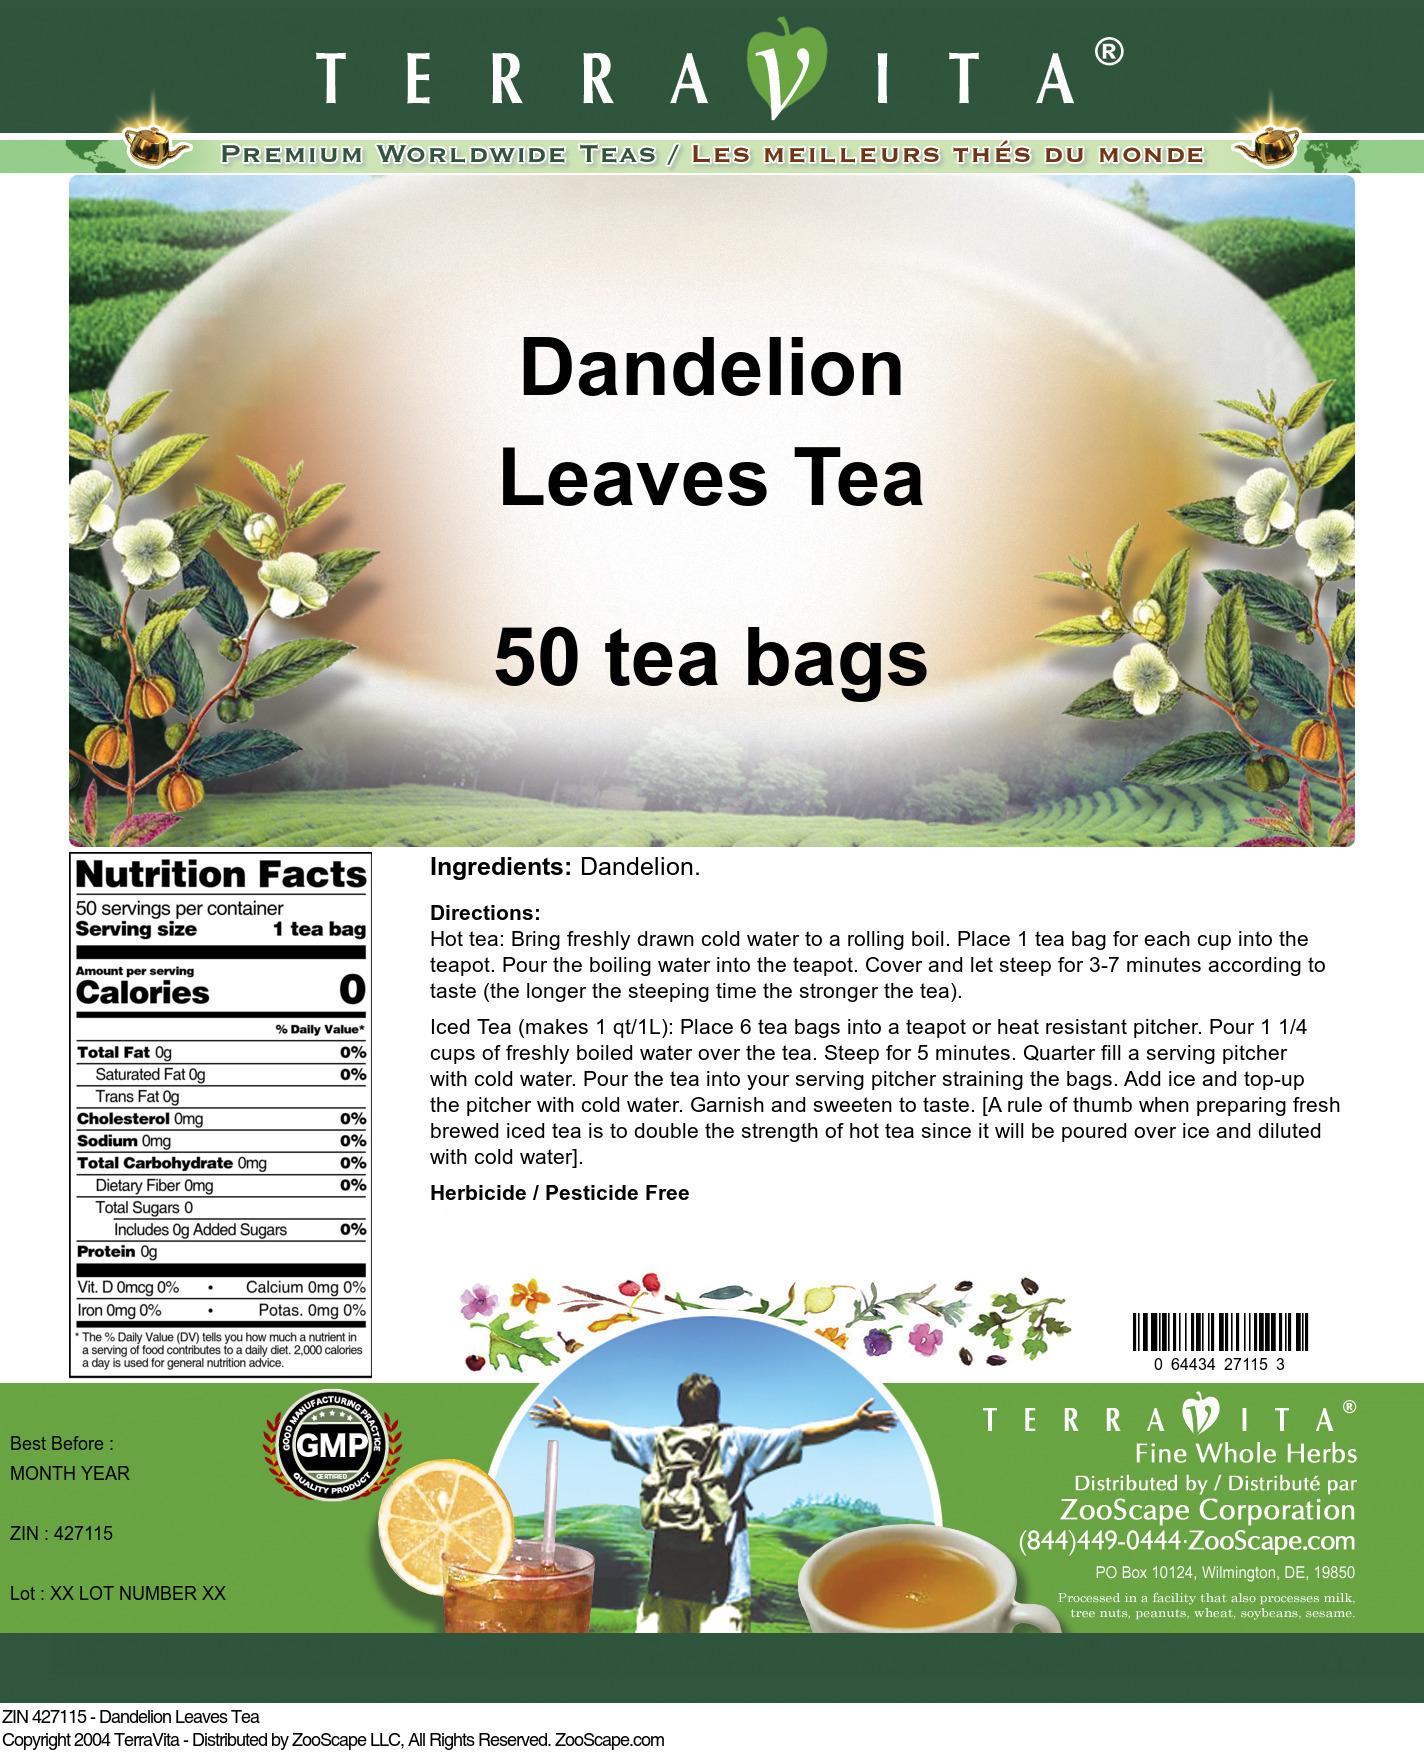 Dandelion Leaves Tea - Label